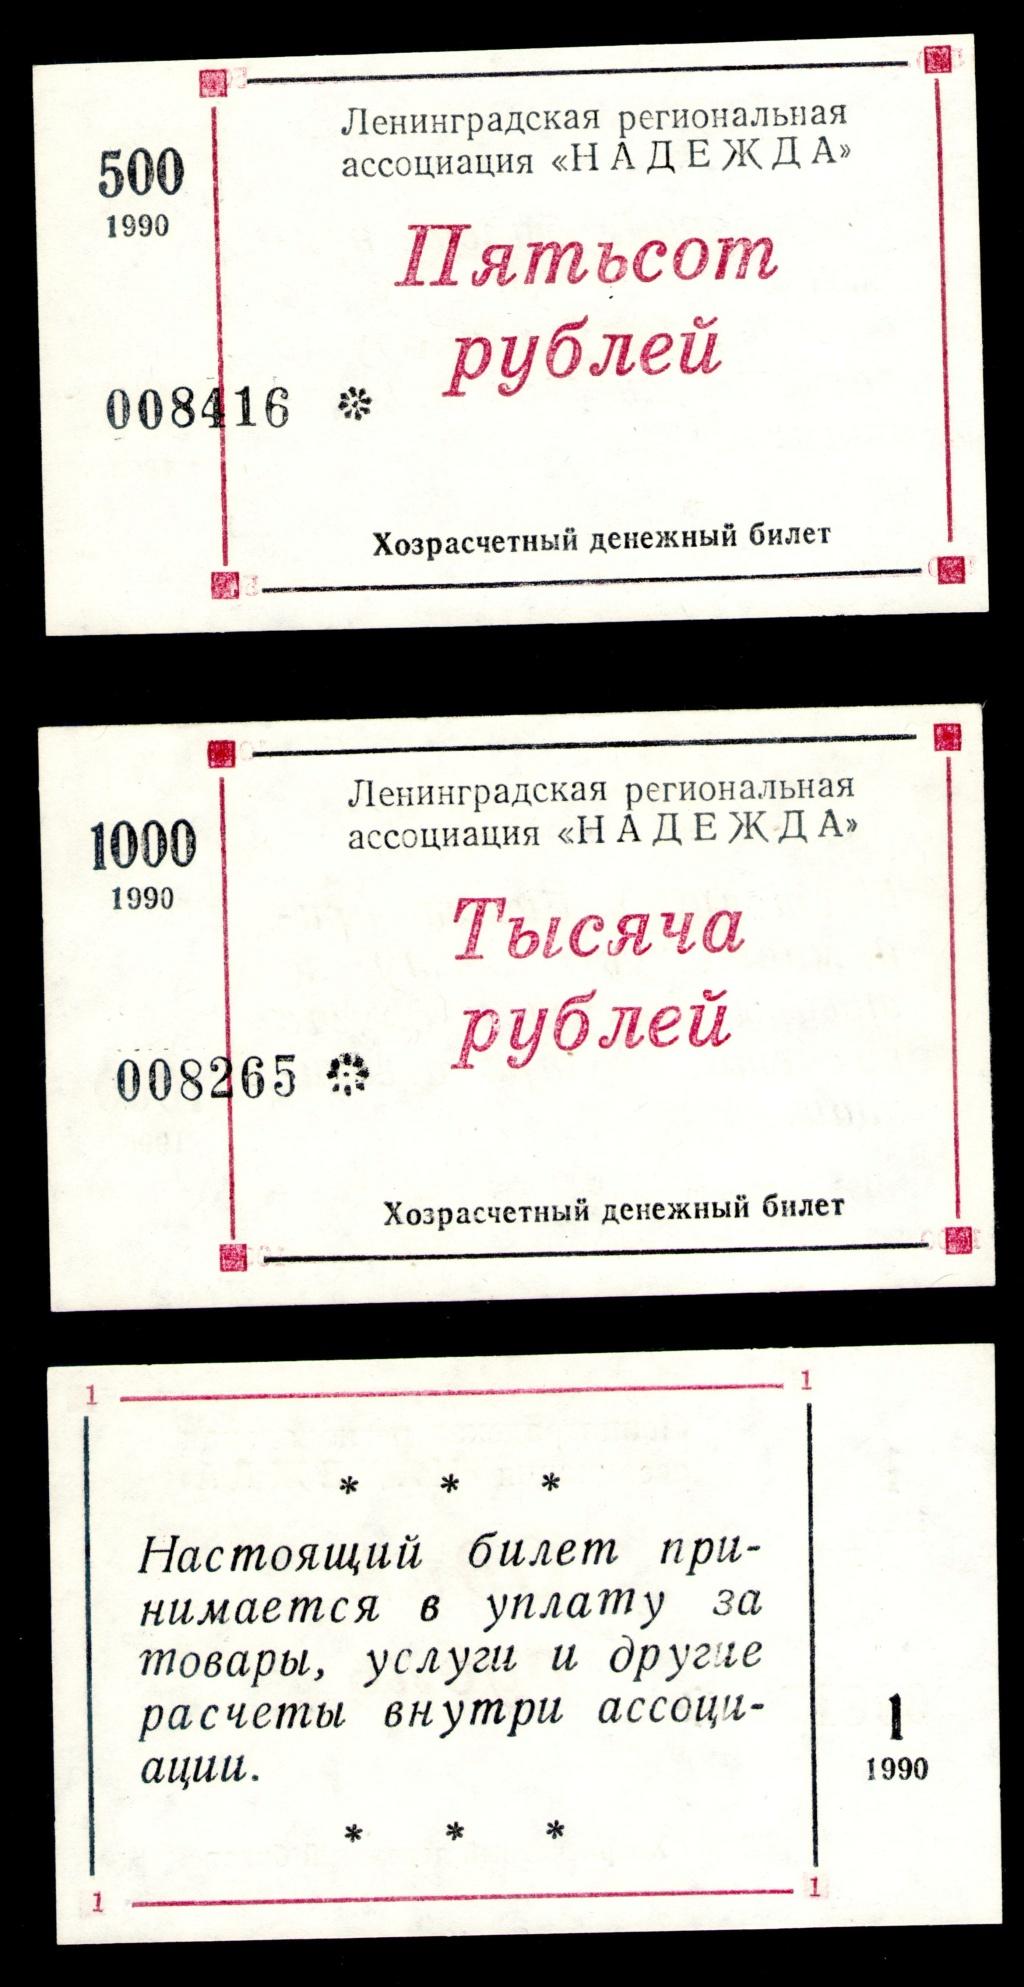 Asociación regional de autosuficiencia 'Nadezhda' (Esperanza) de Leningrado 1.990 Asocia12